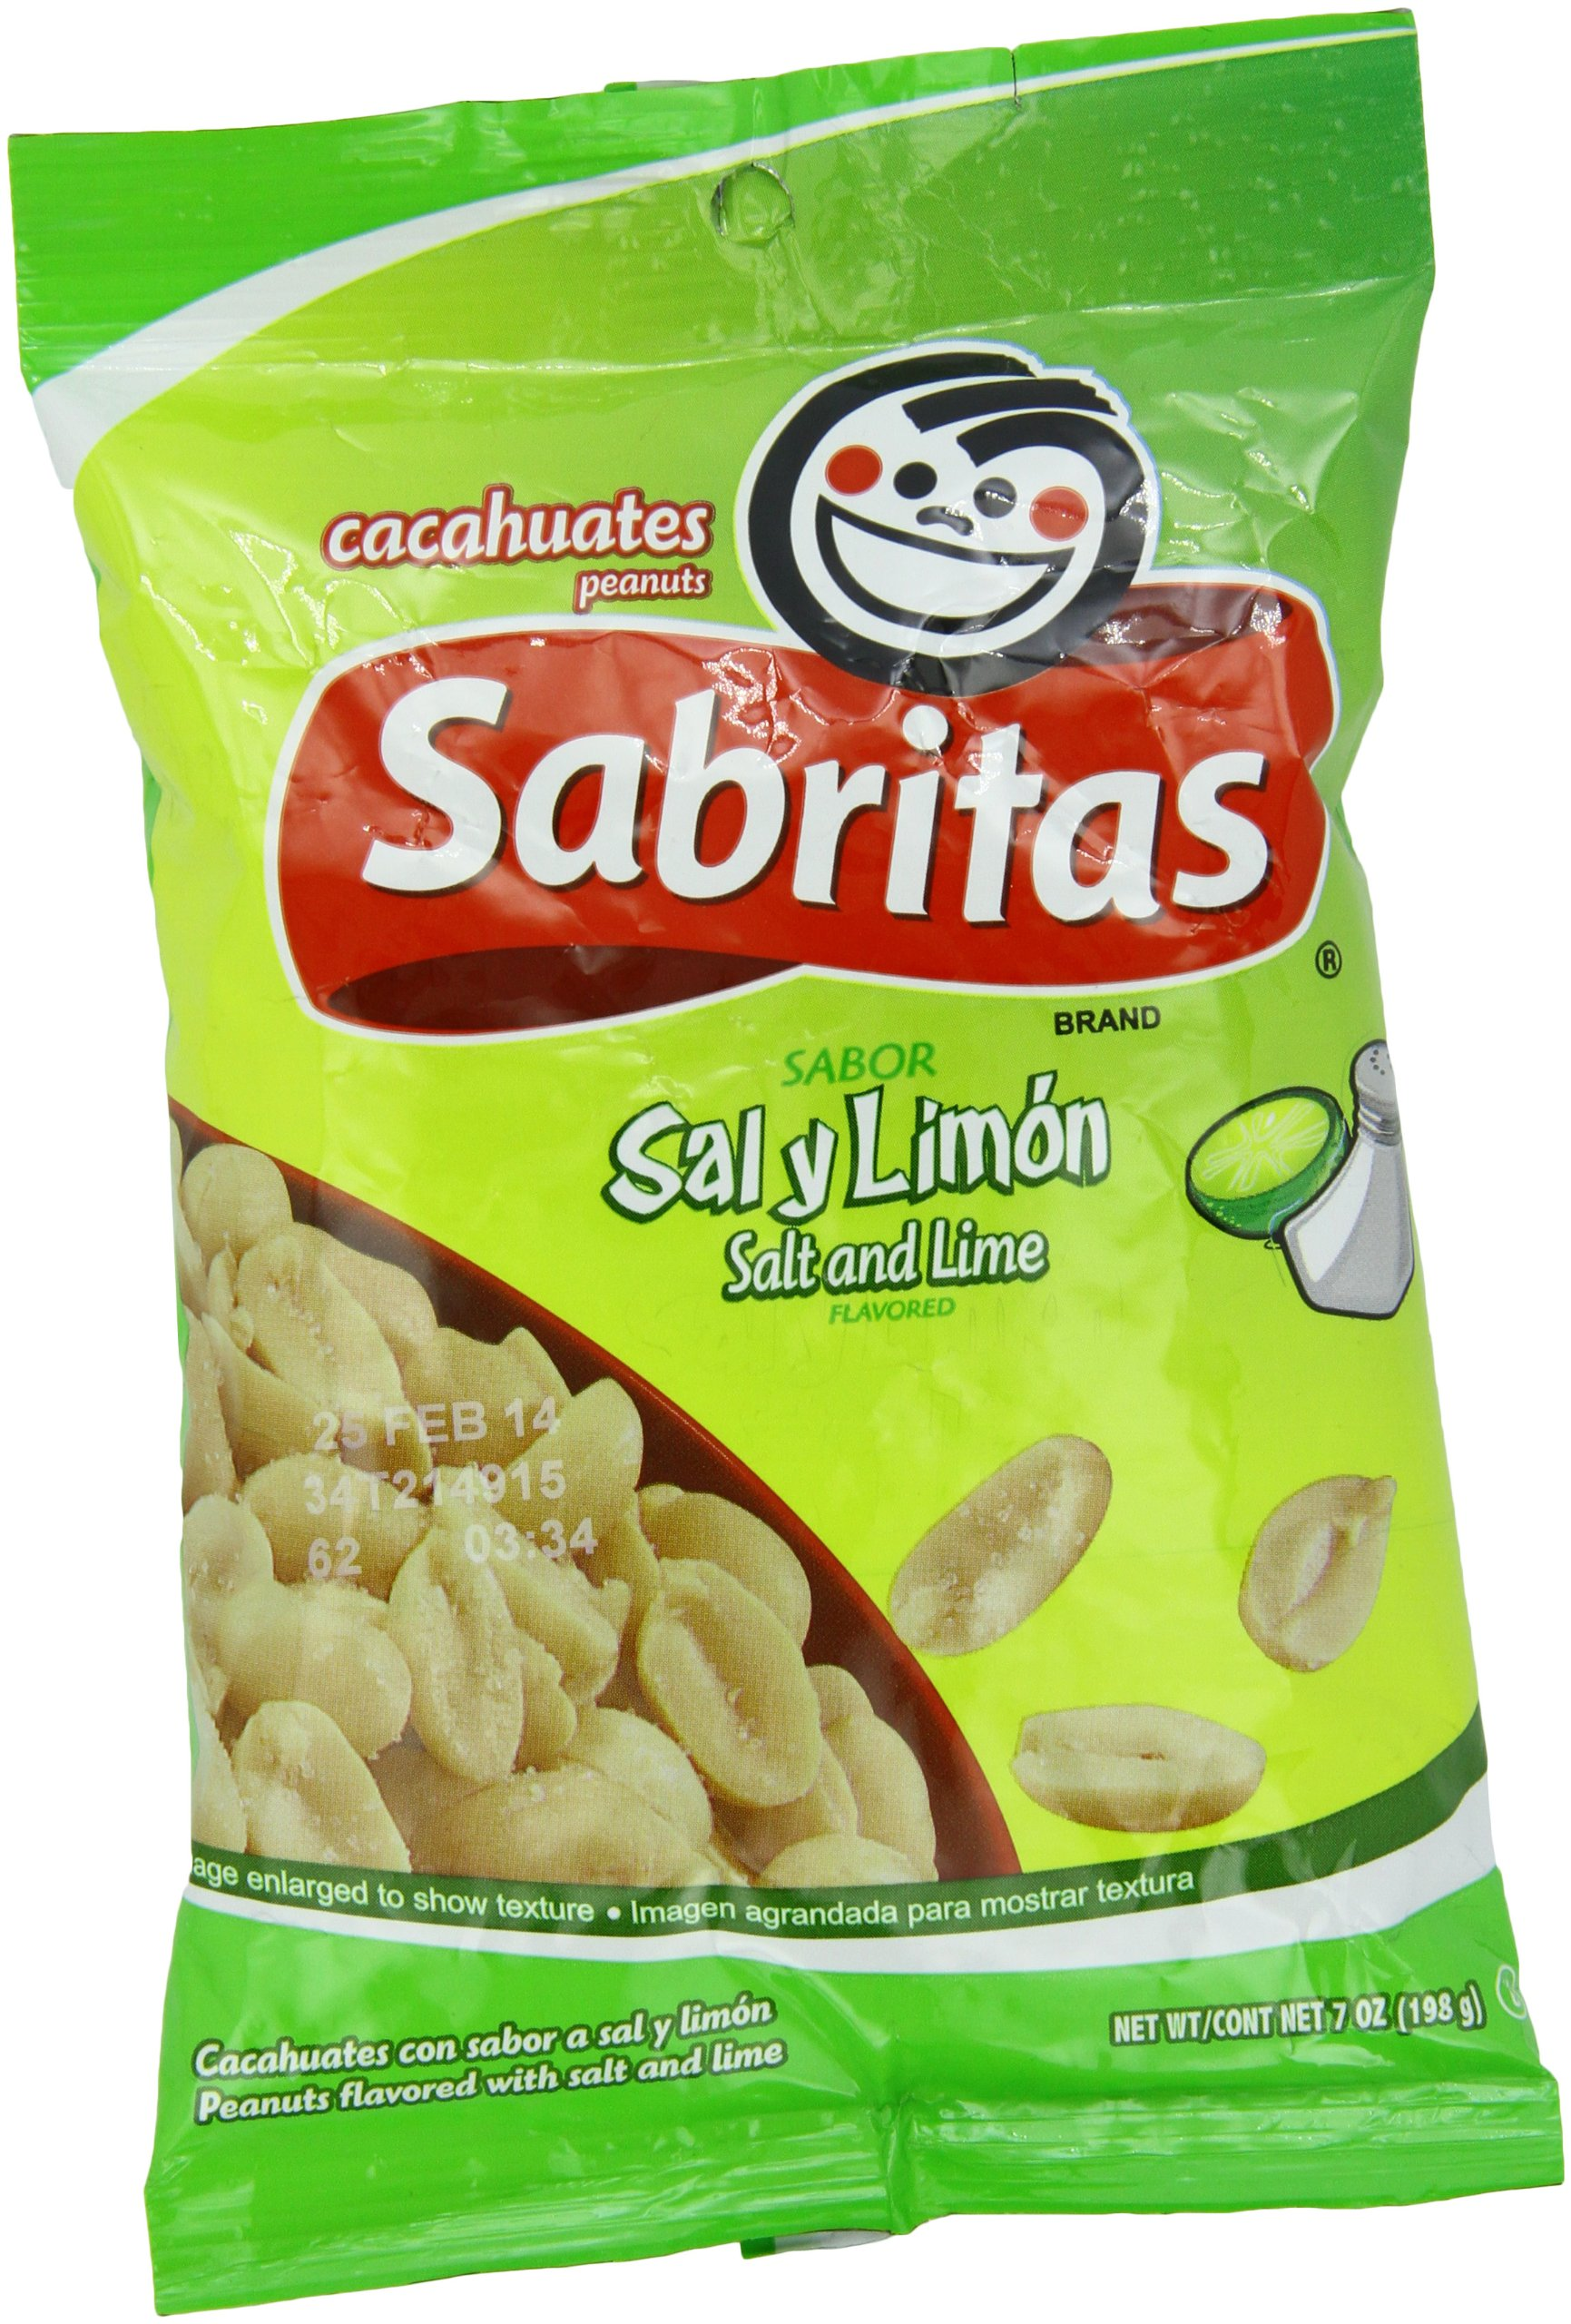 Amazoncom Sabritas Cacahuates Peanuts Chile Limon171g Kacang